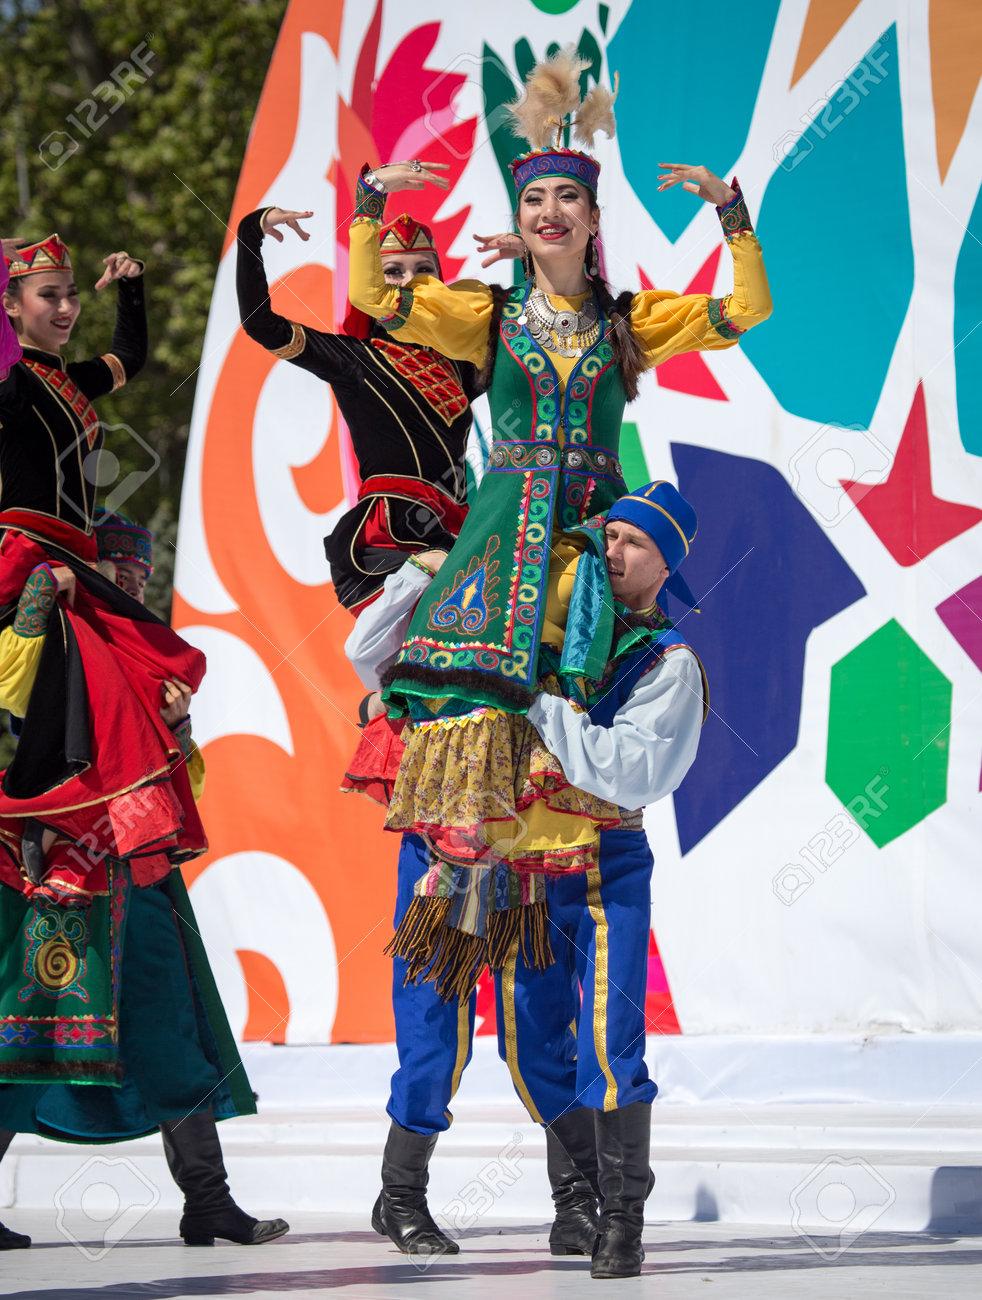 Shymkent, KAZAKHSTAN - May 1, 2017: People in national costumes